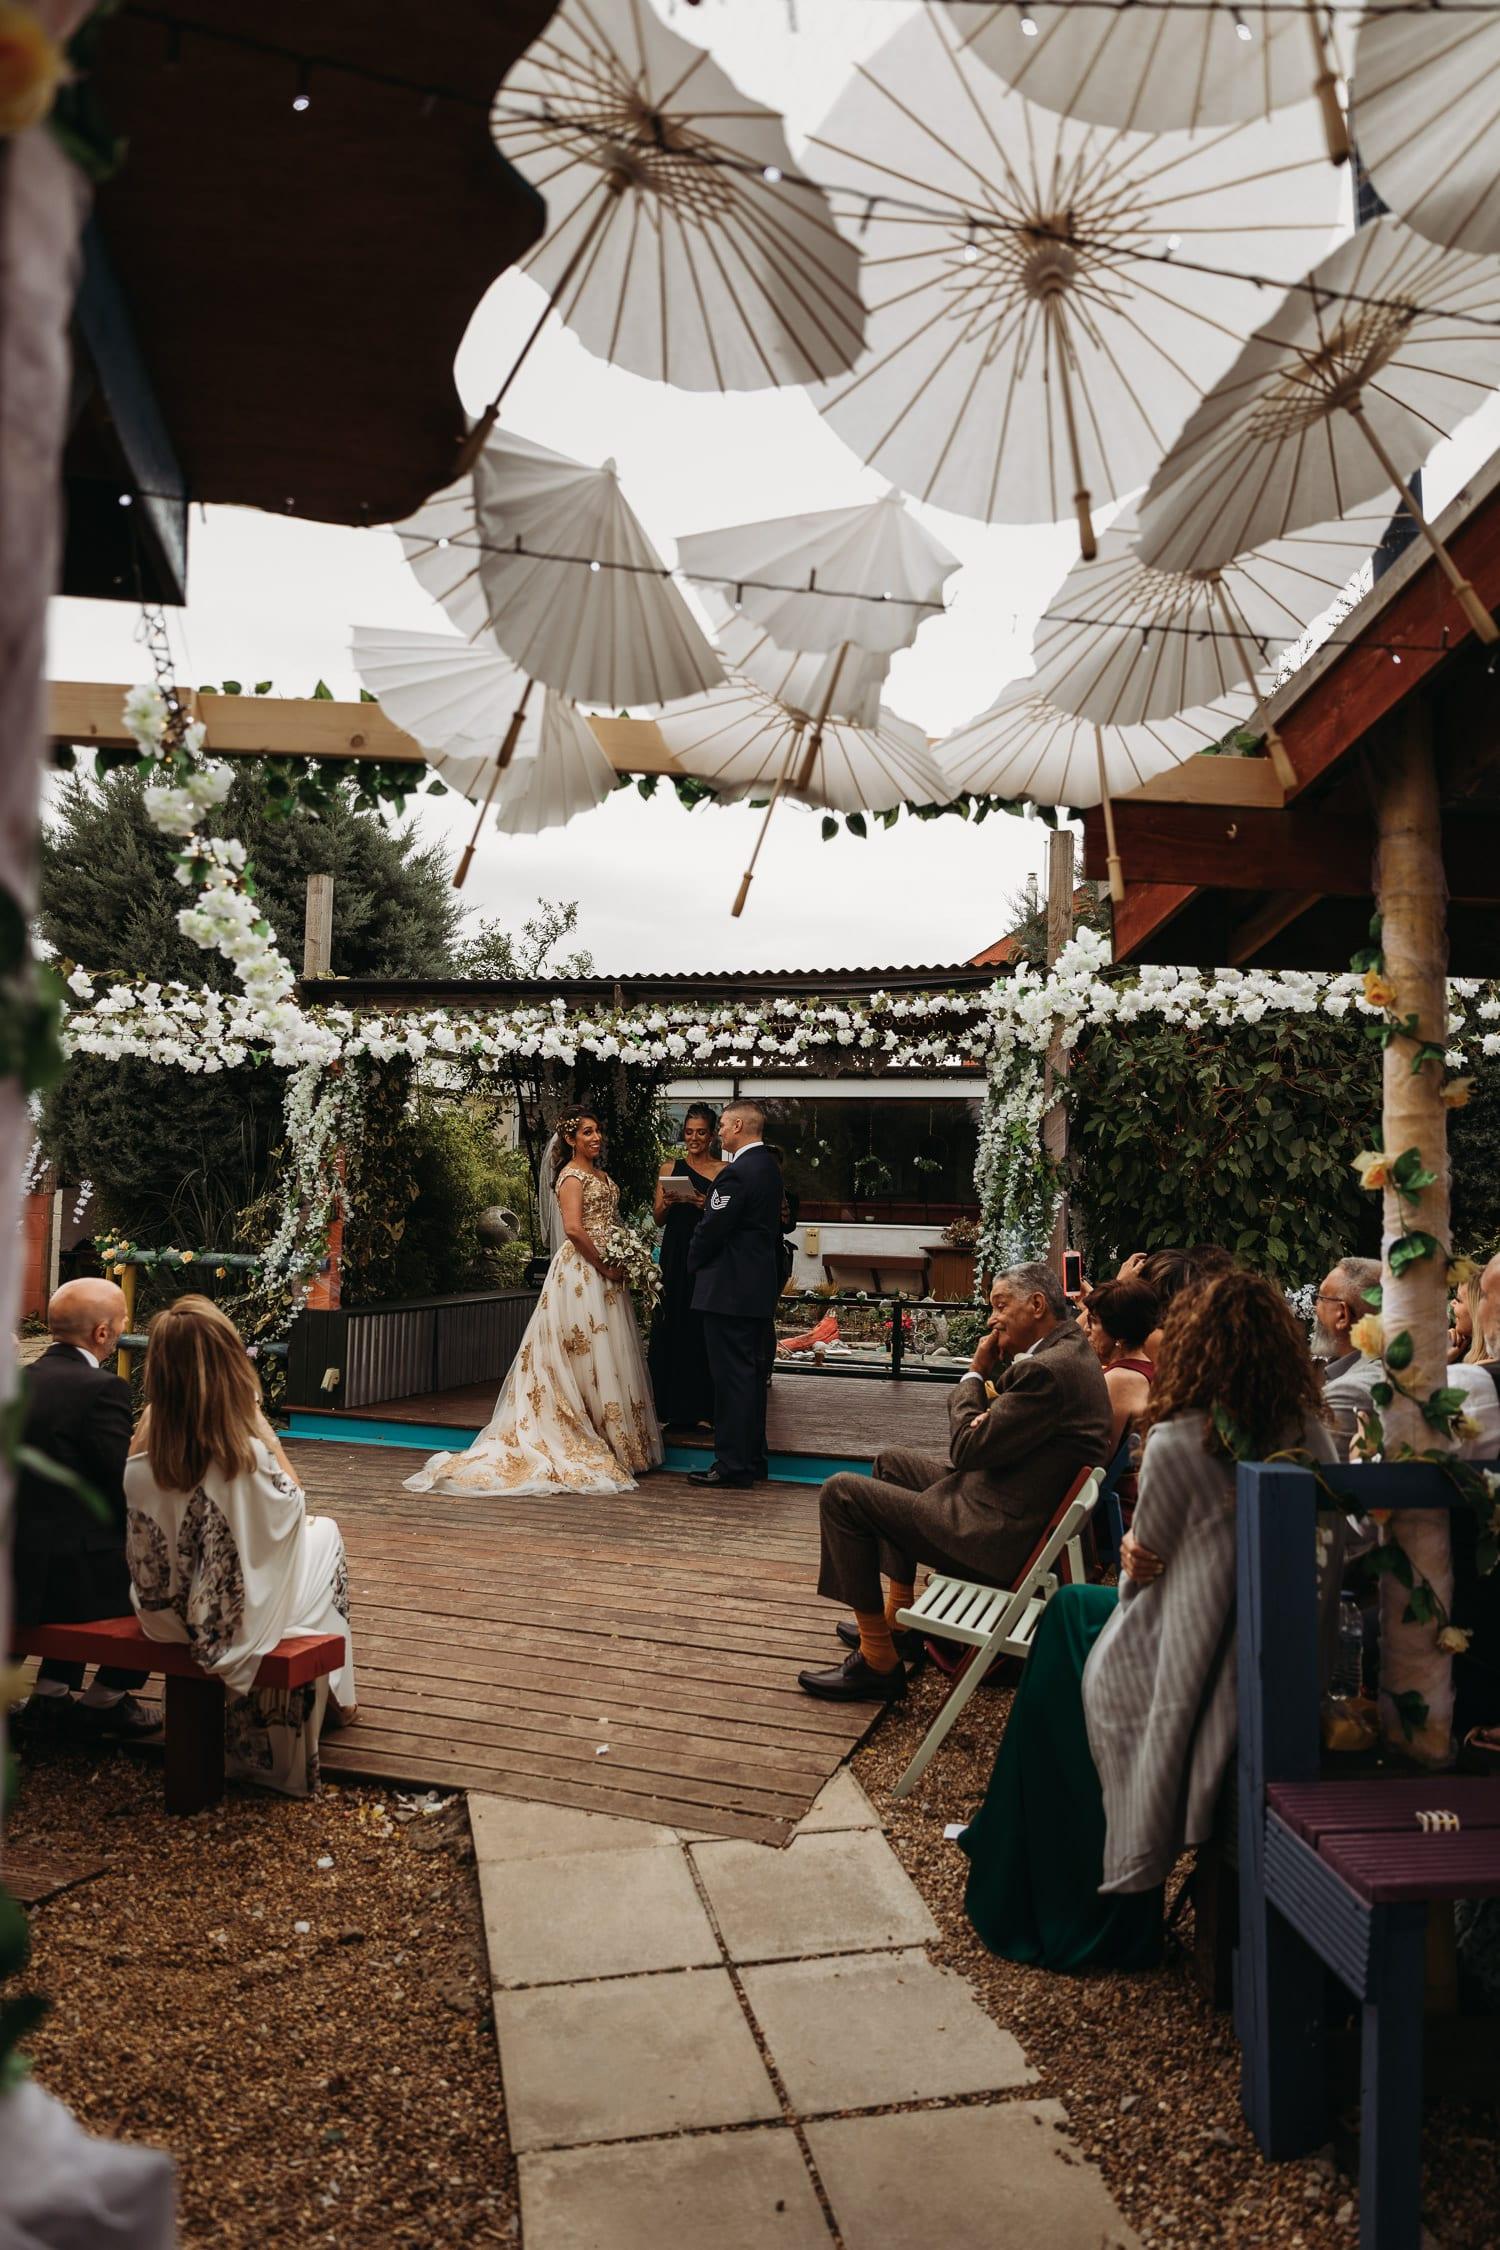 The Missing Sock Wedding